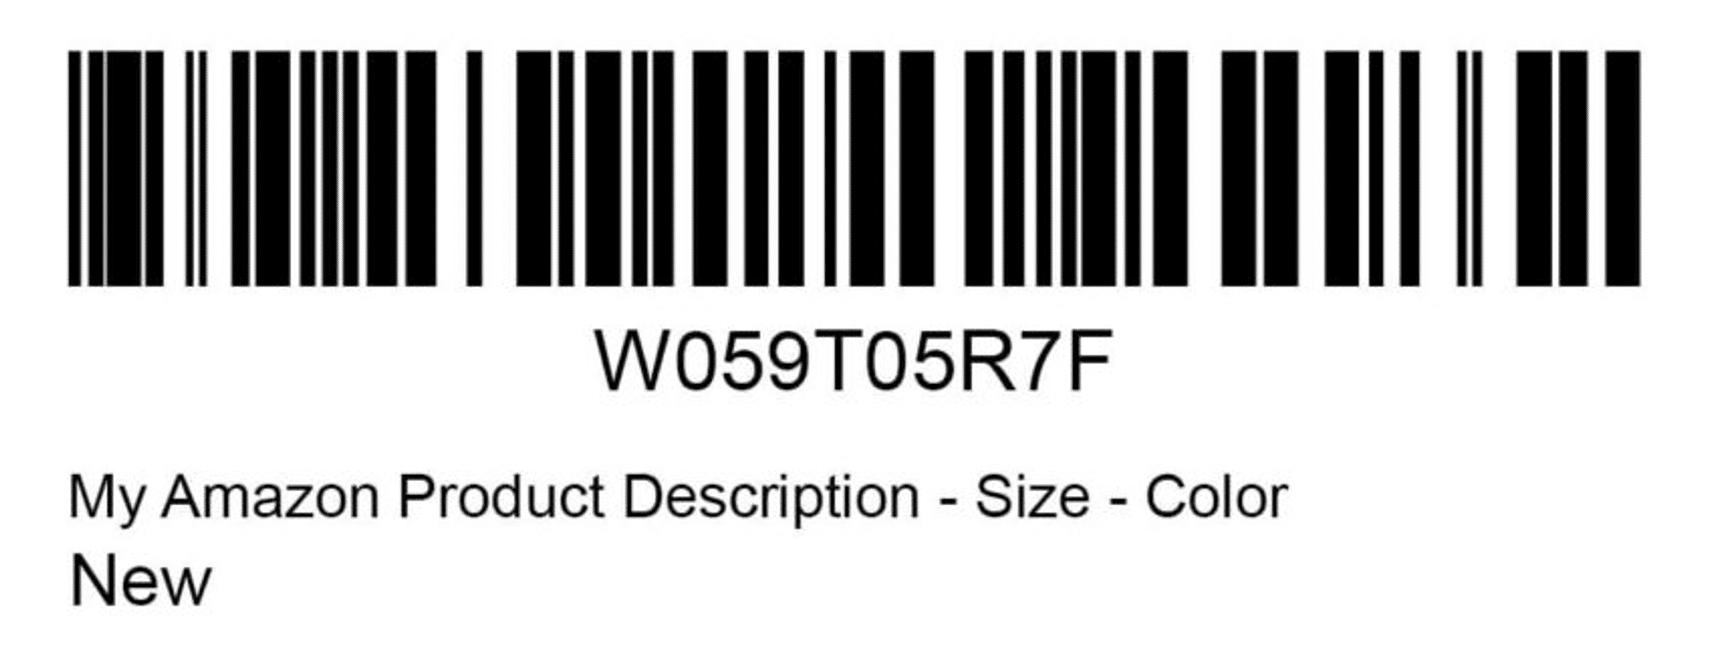 Amazon FBA Label demo